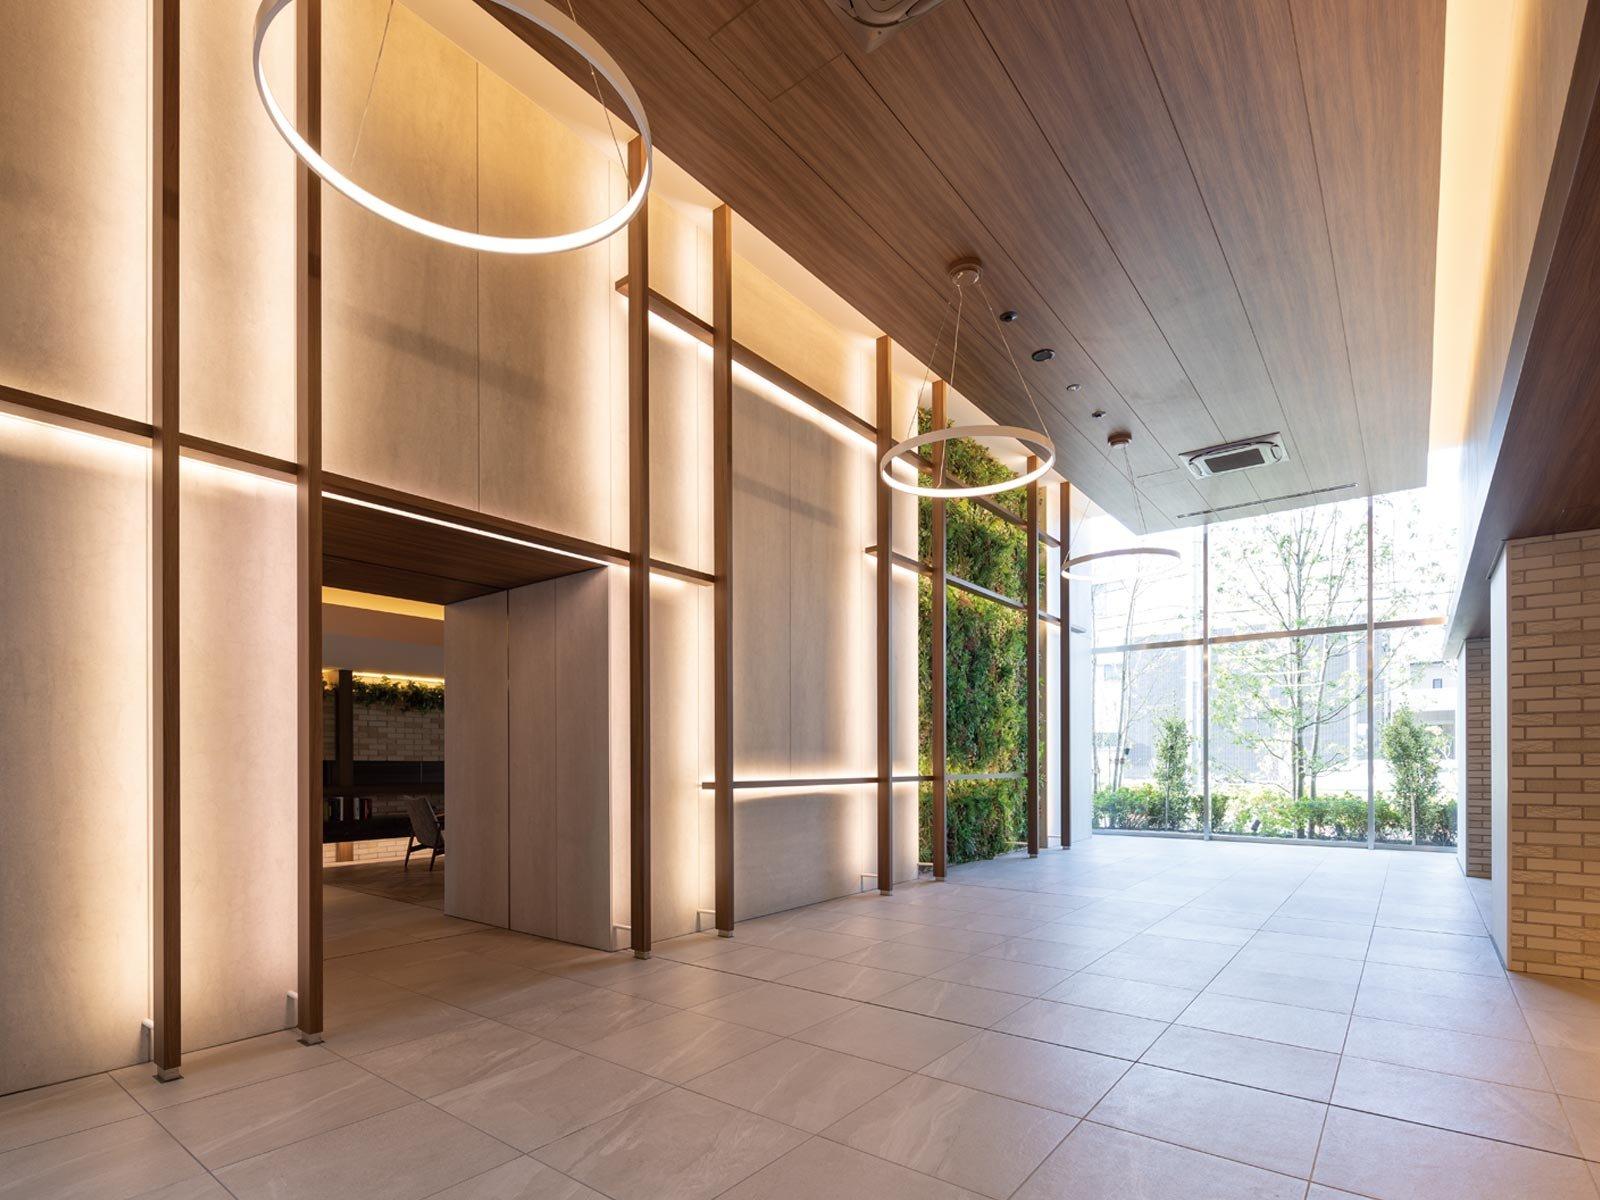 entrance-hall01_city-mitaka.jpg